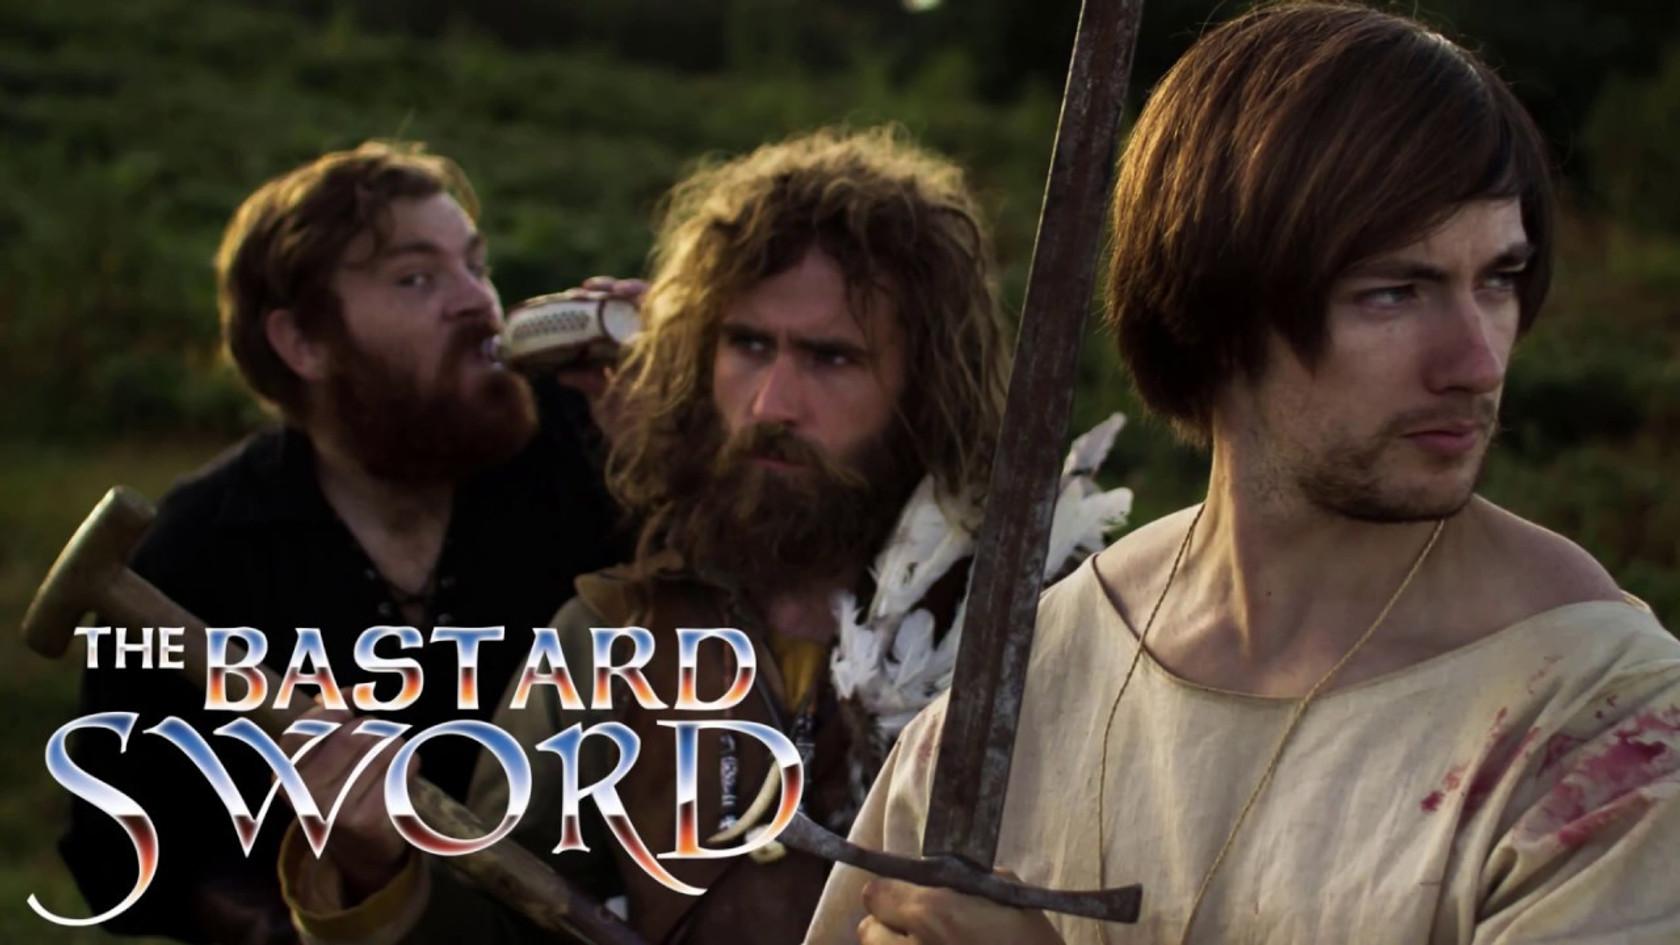 Xander in The Bastard Sword